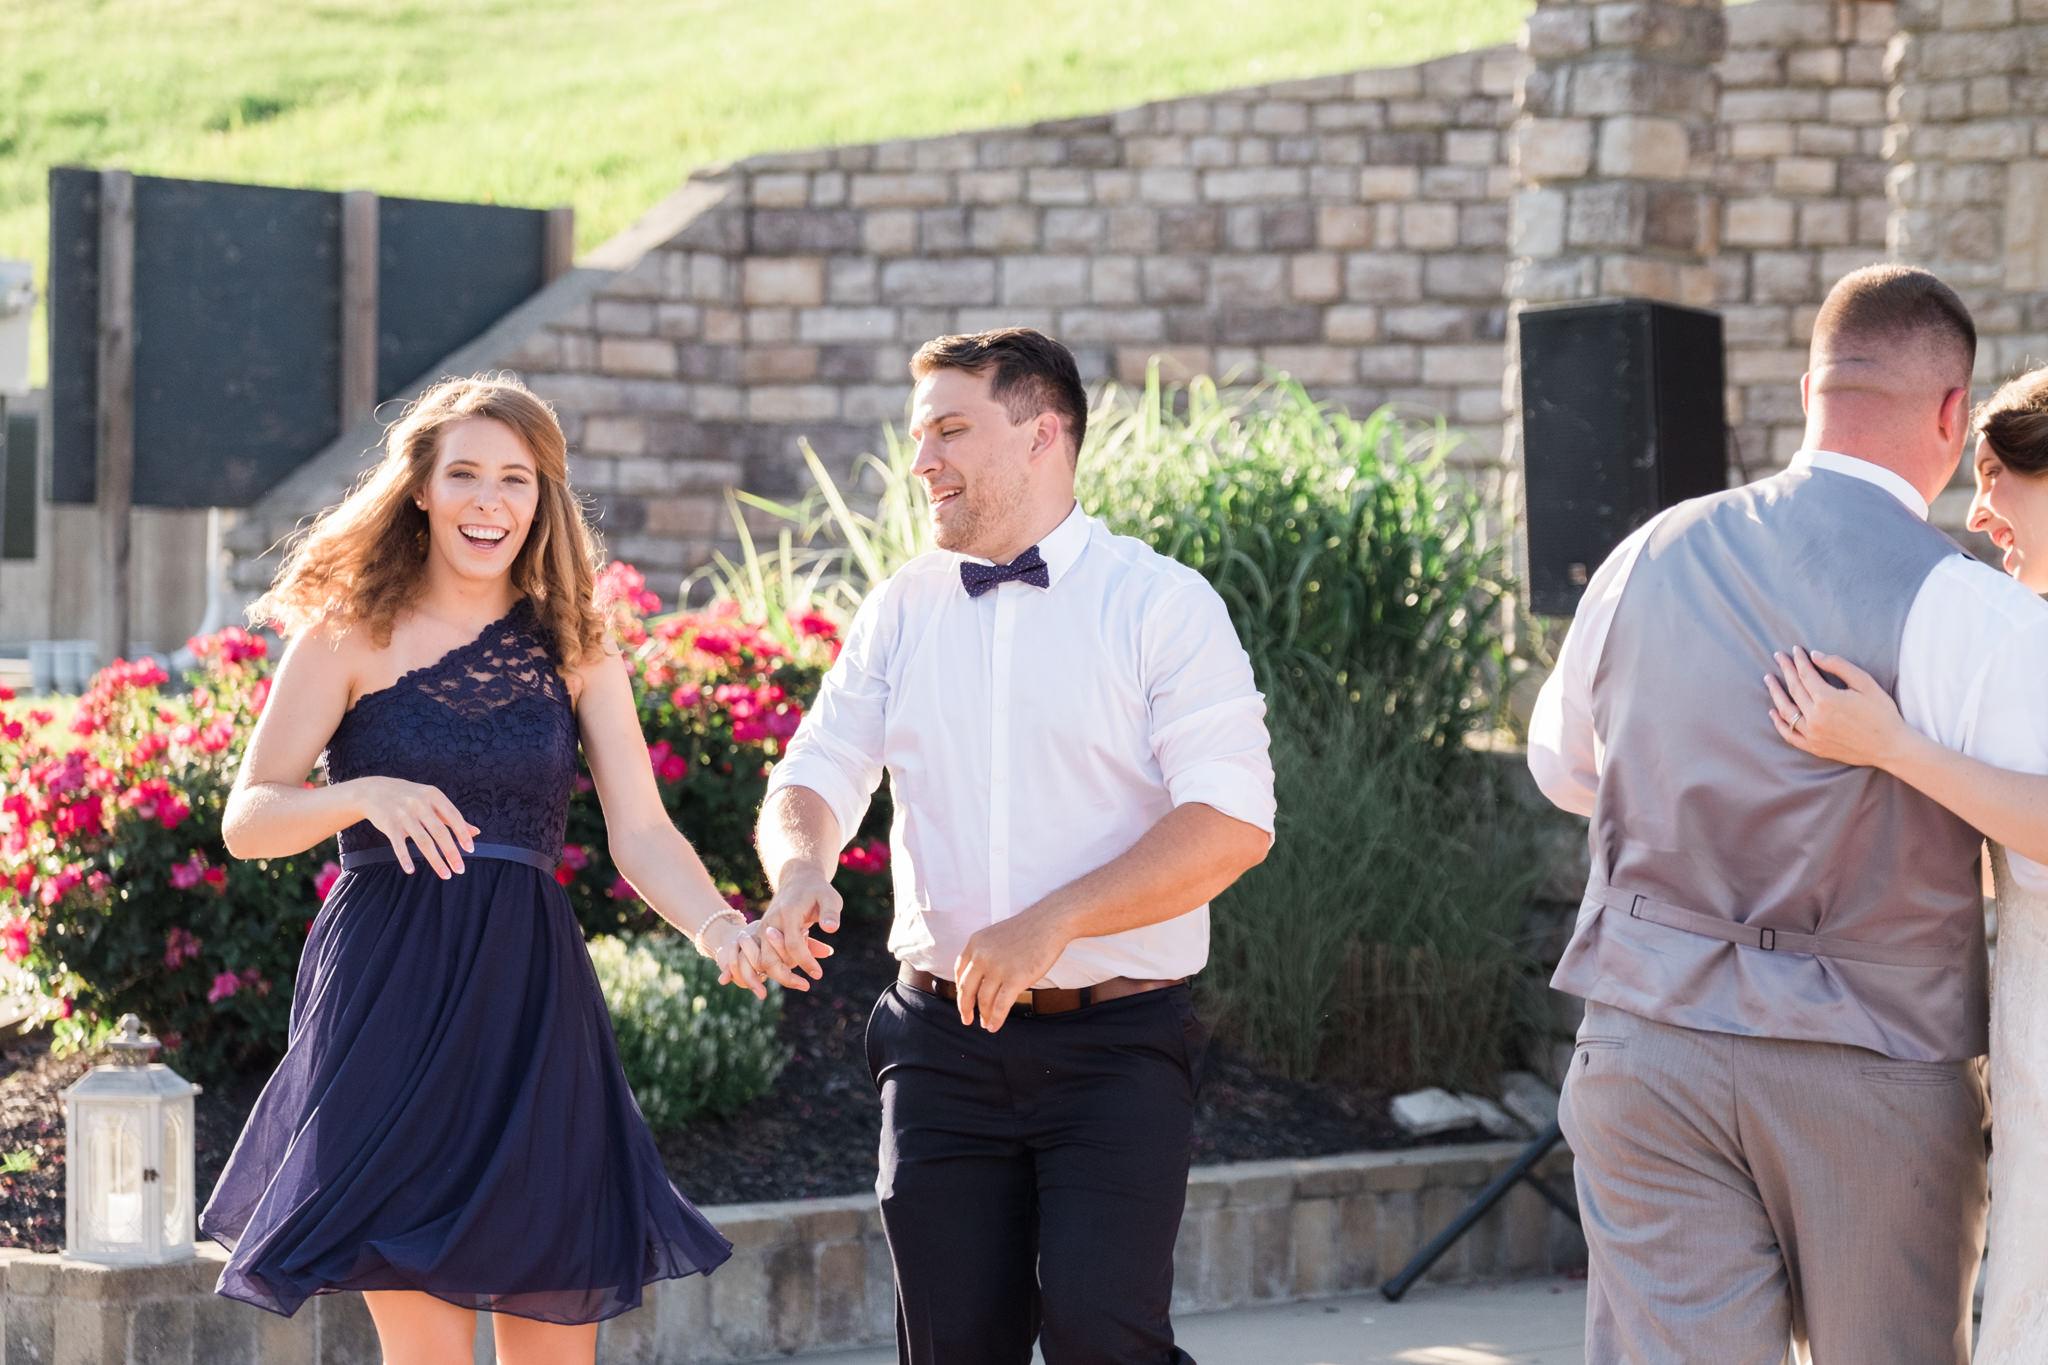 2017.06.03_Callie&Dustin_Wedding_Blog_0055.jpg